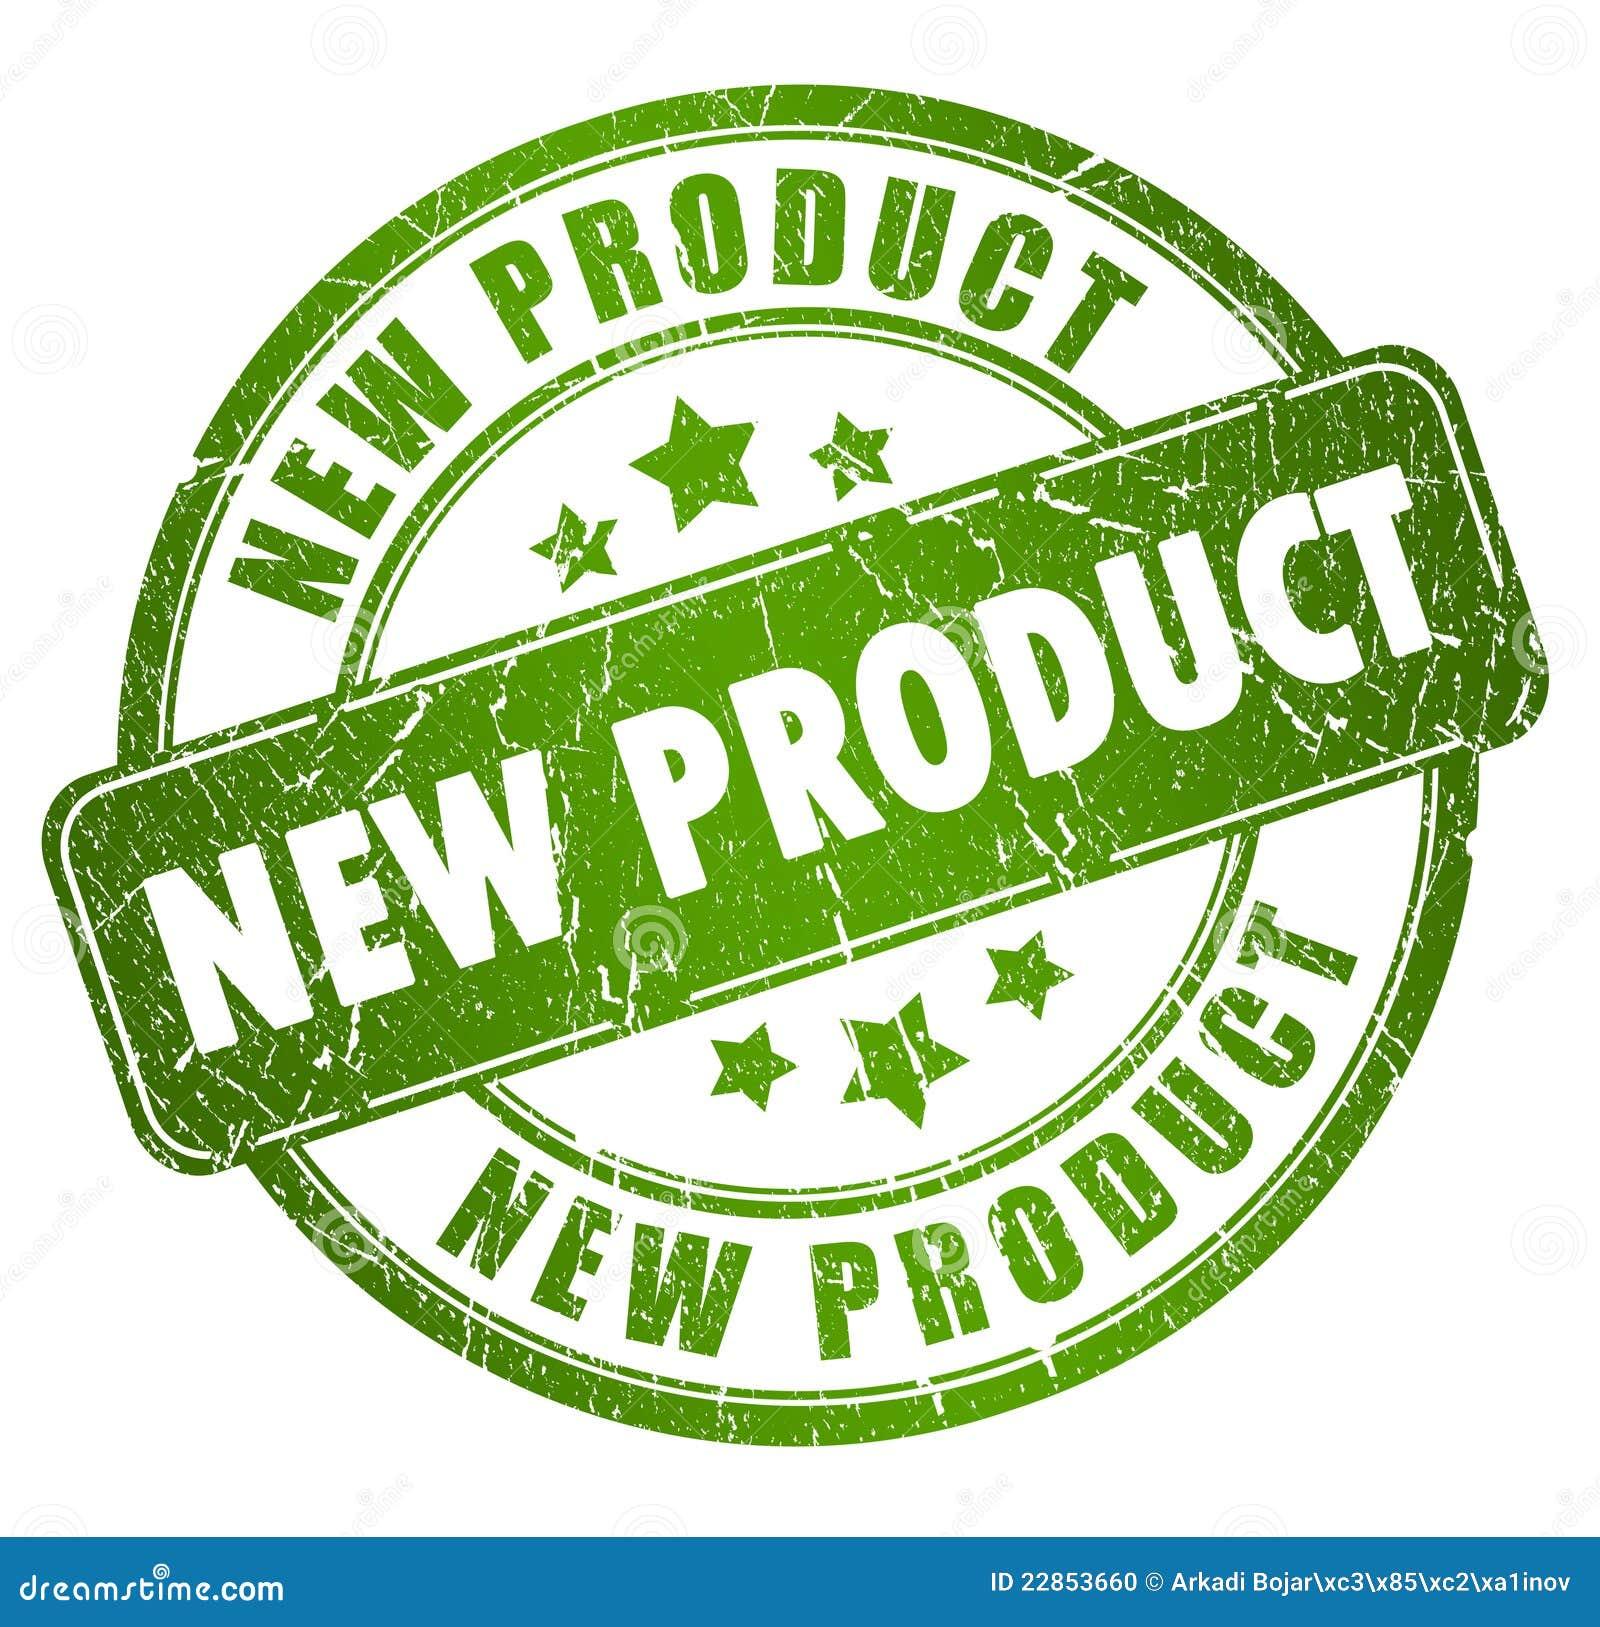 new product stock illustration illustration of insignia 22853660